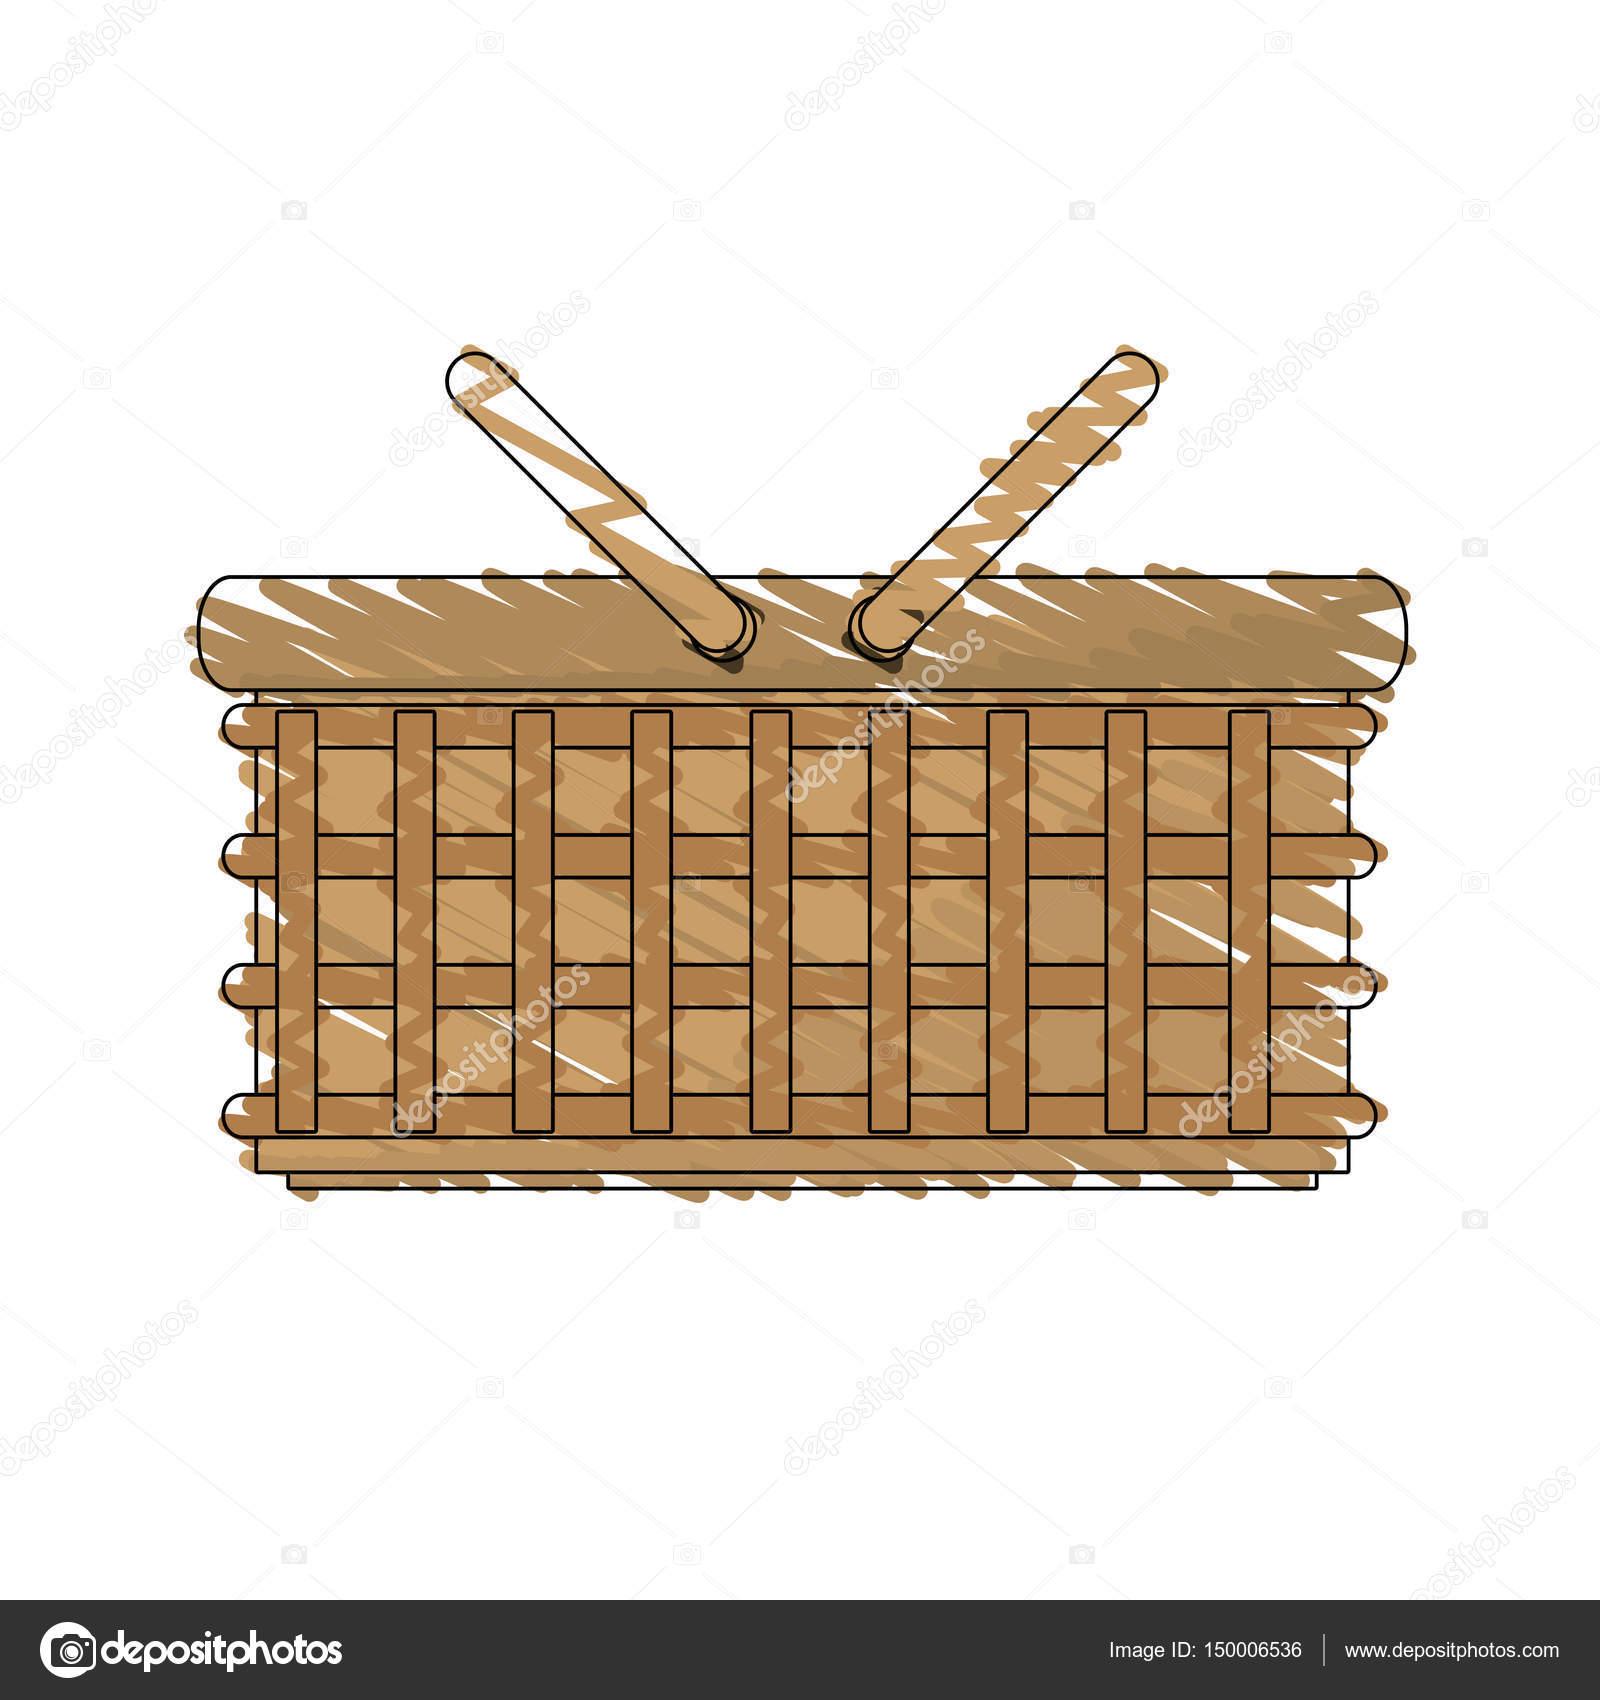 1600x1700 Drawing Wicker Basket Picnic Image Stock Vector Djv